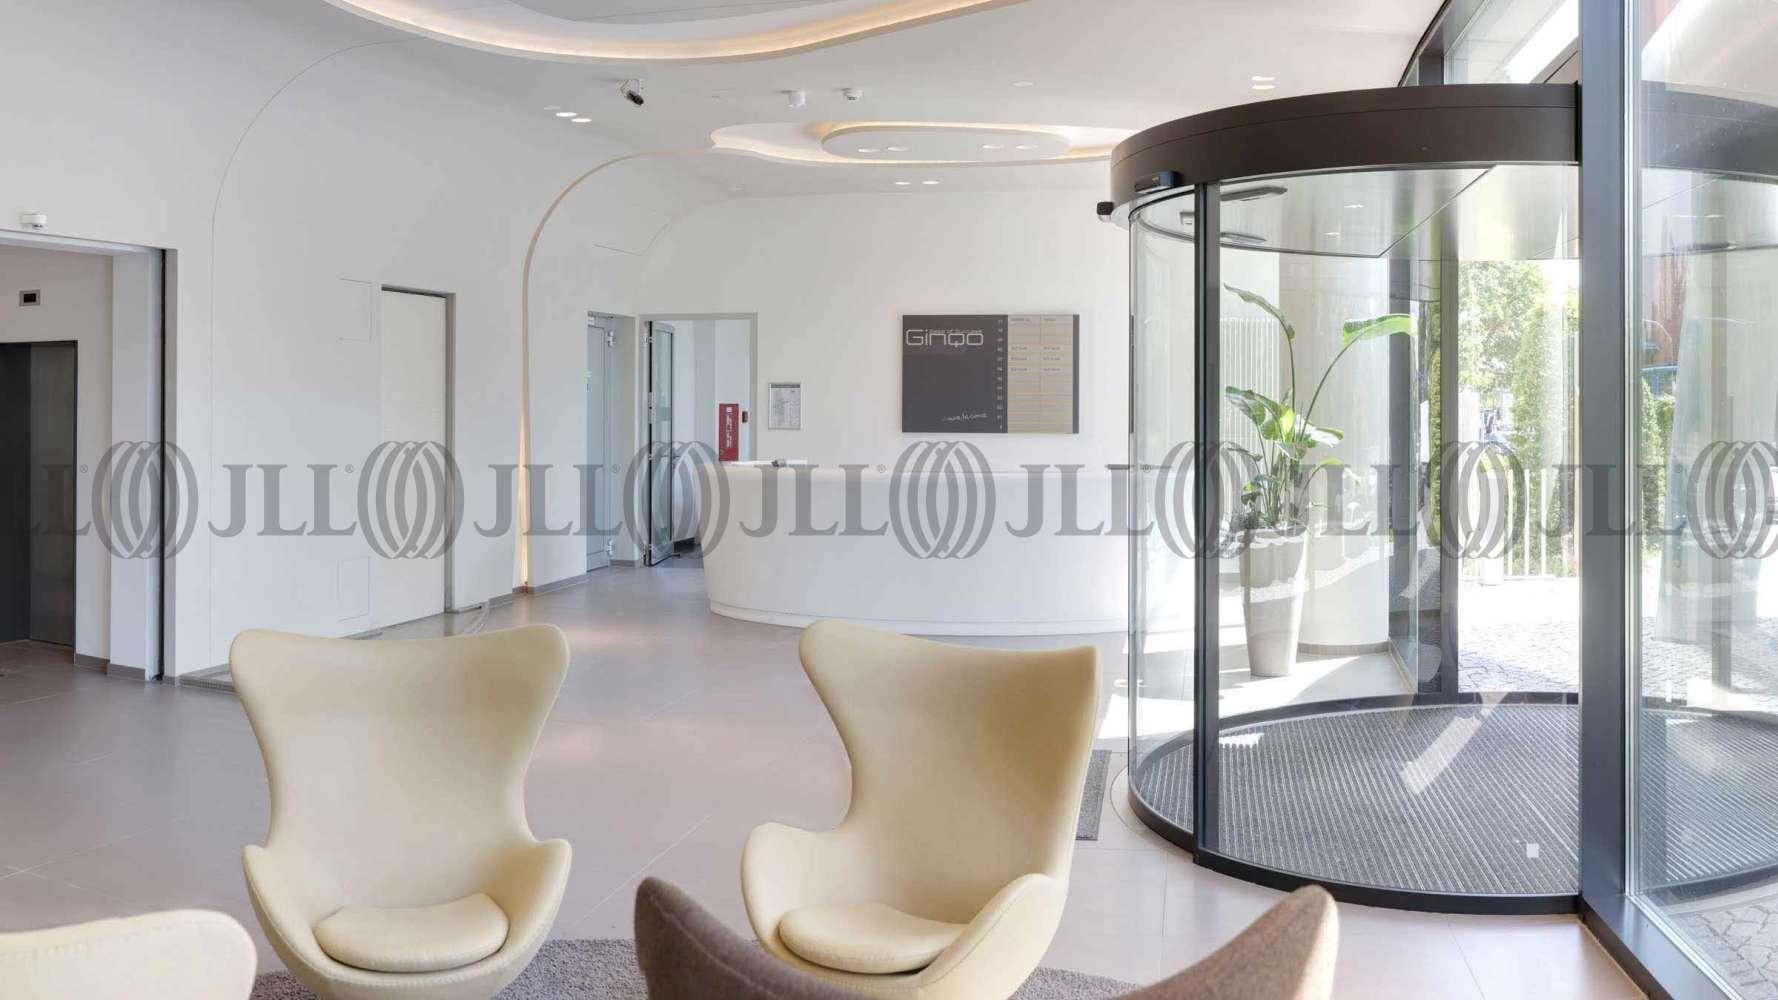 Büros Frankfurt am main, 60528 - Büro - Frankfurt am Main, Niederrad - F1256 - 9525283